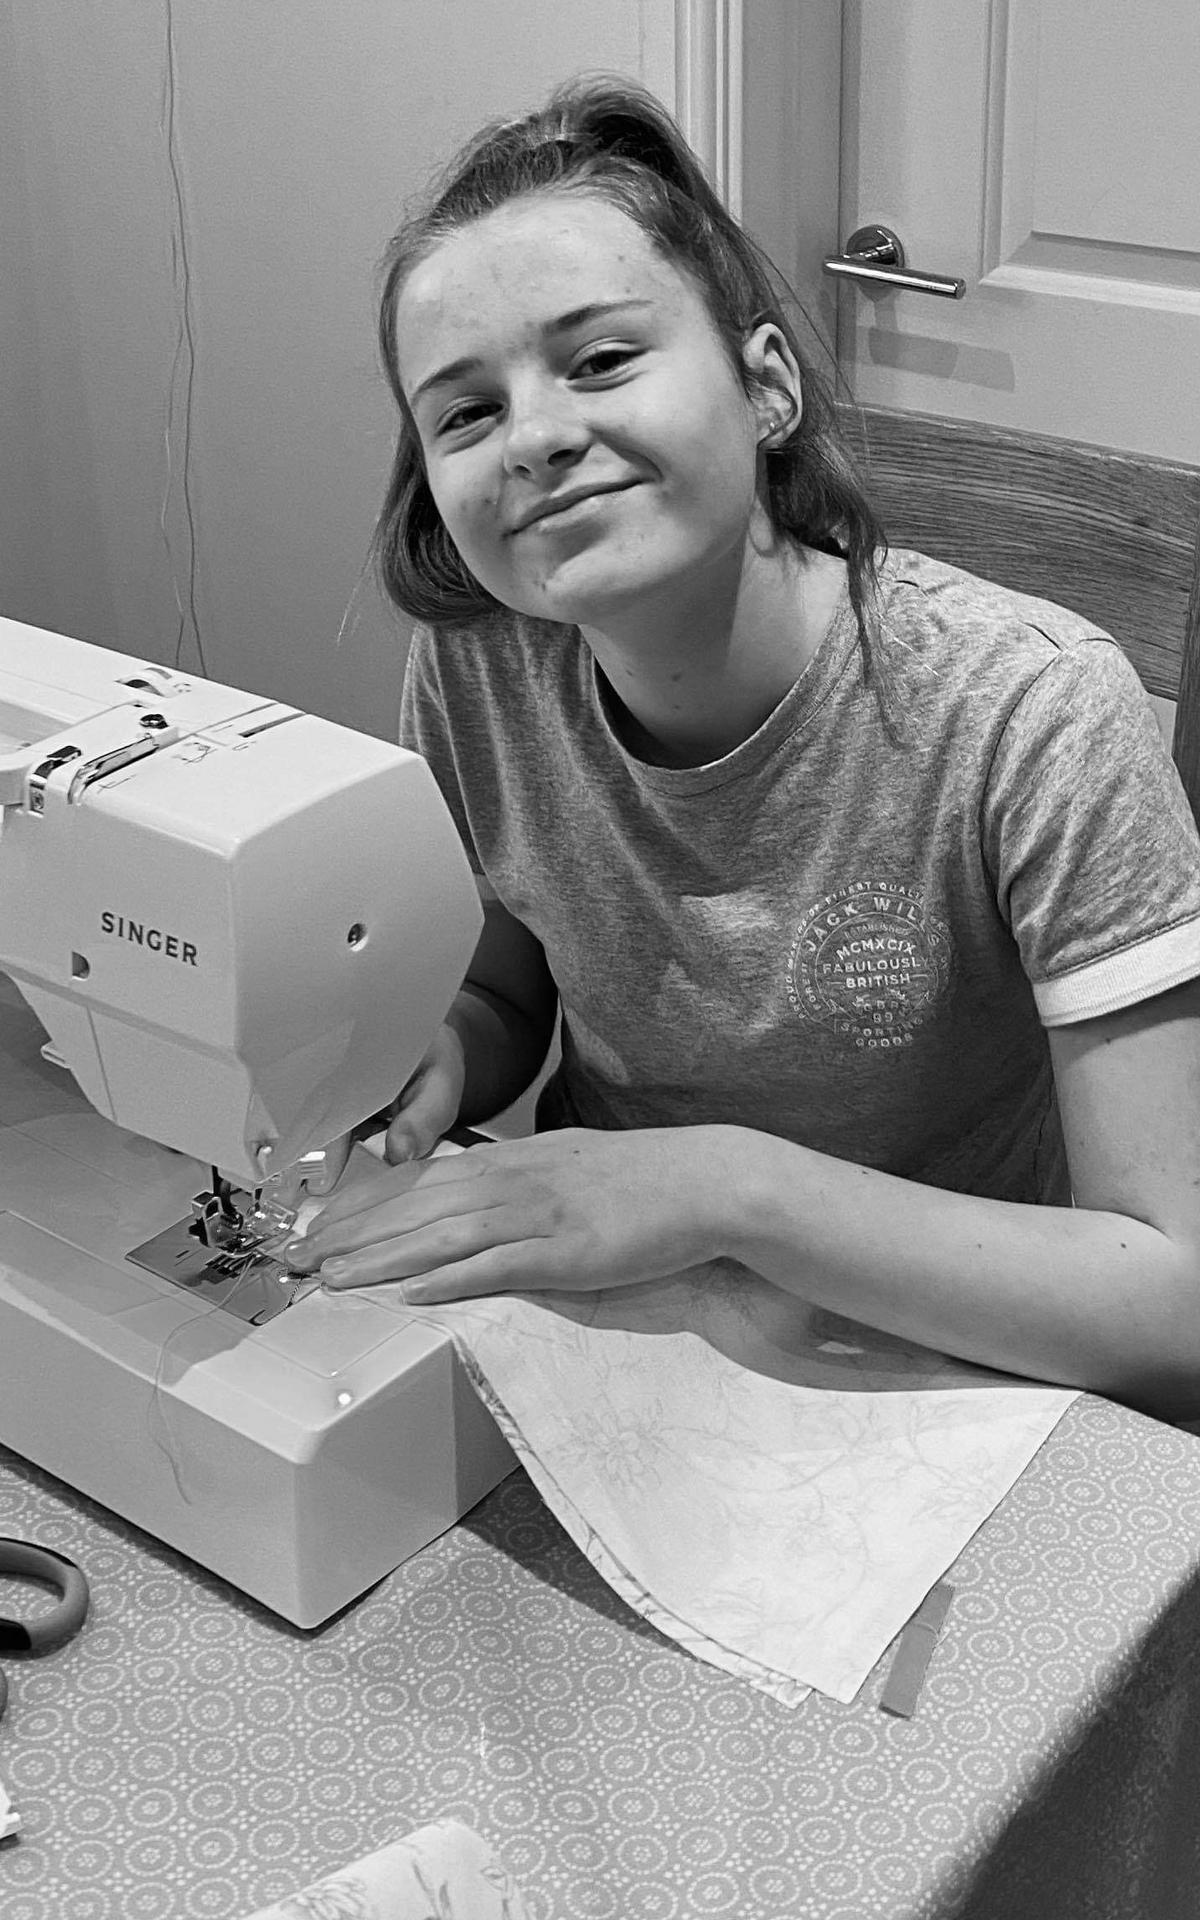 Freya sewing on sewing machine